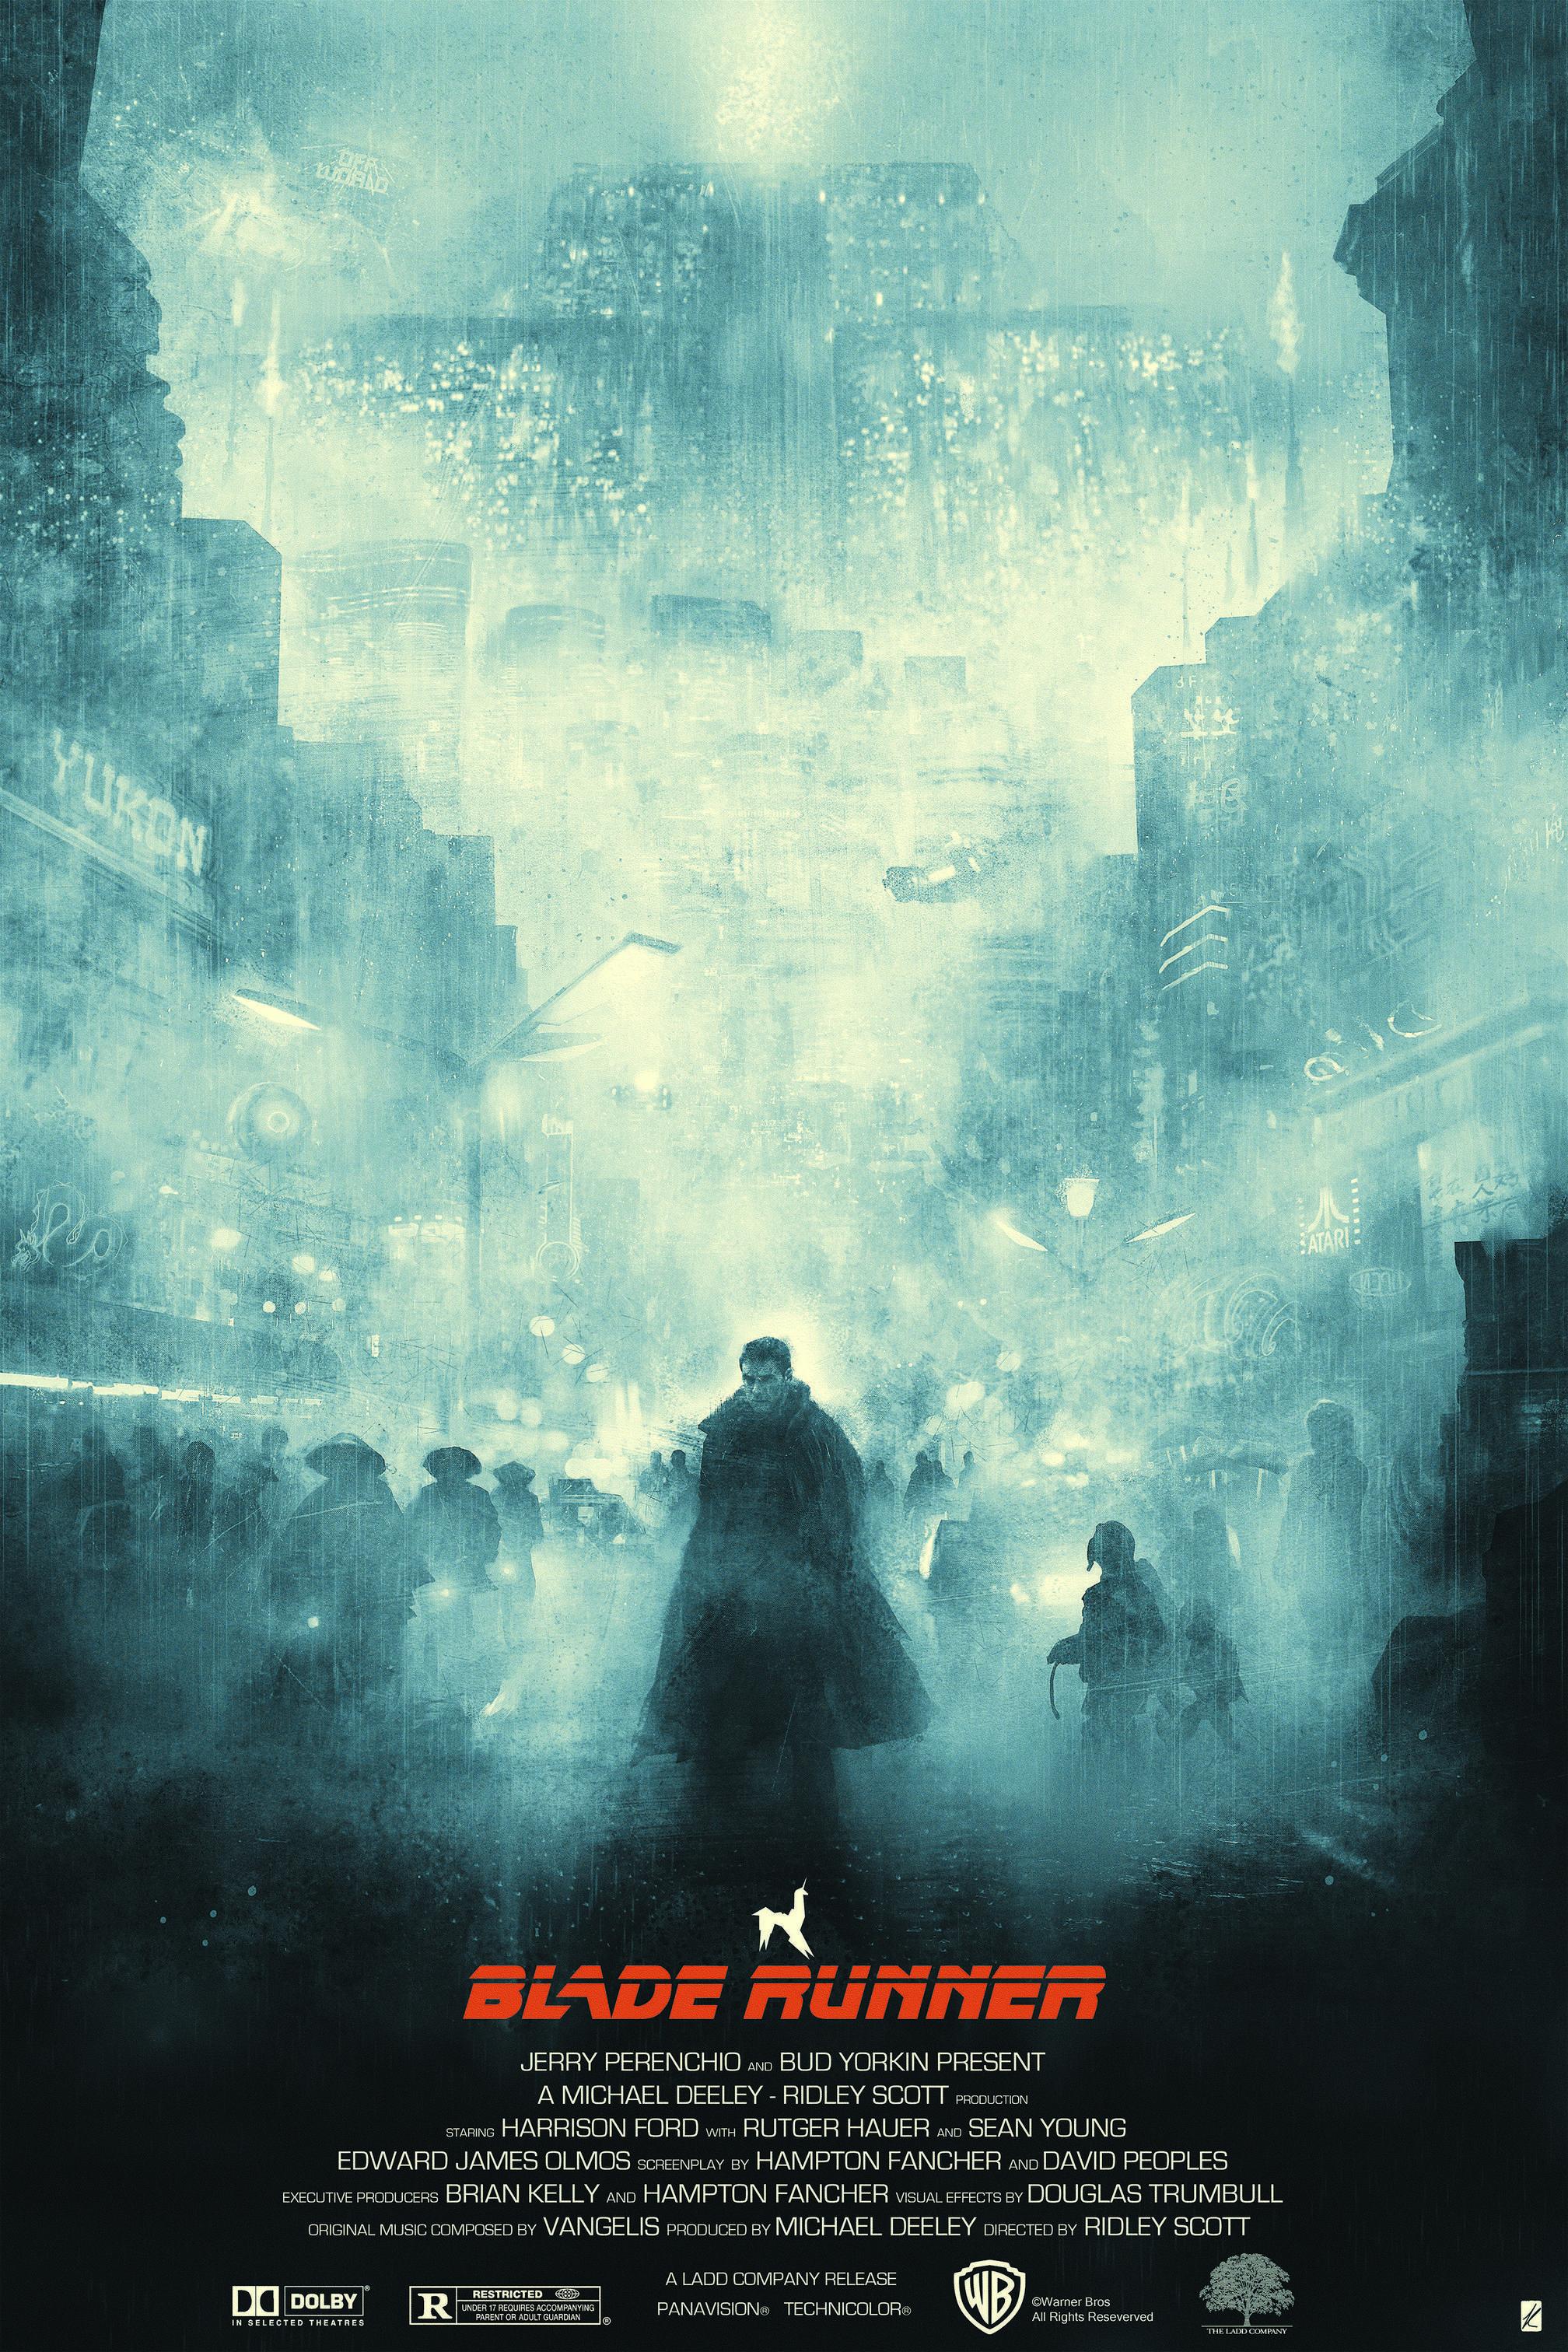 Blade Runner 1982 Hd Wallpaper From Gallsource Com Sf映画